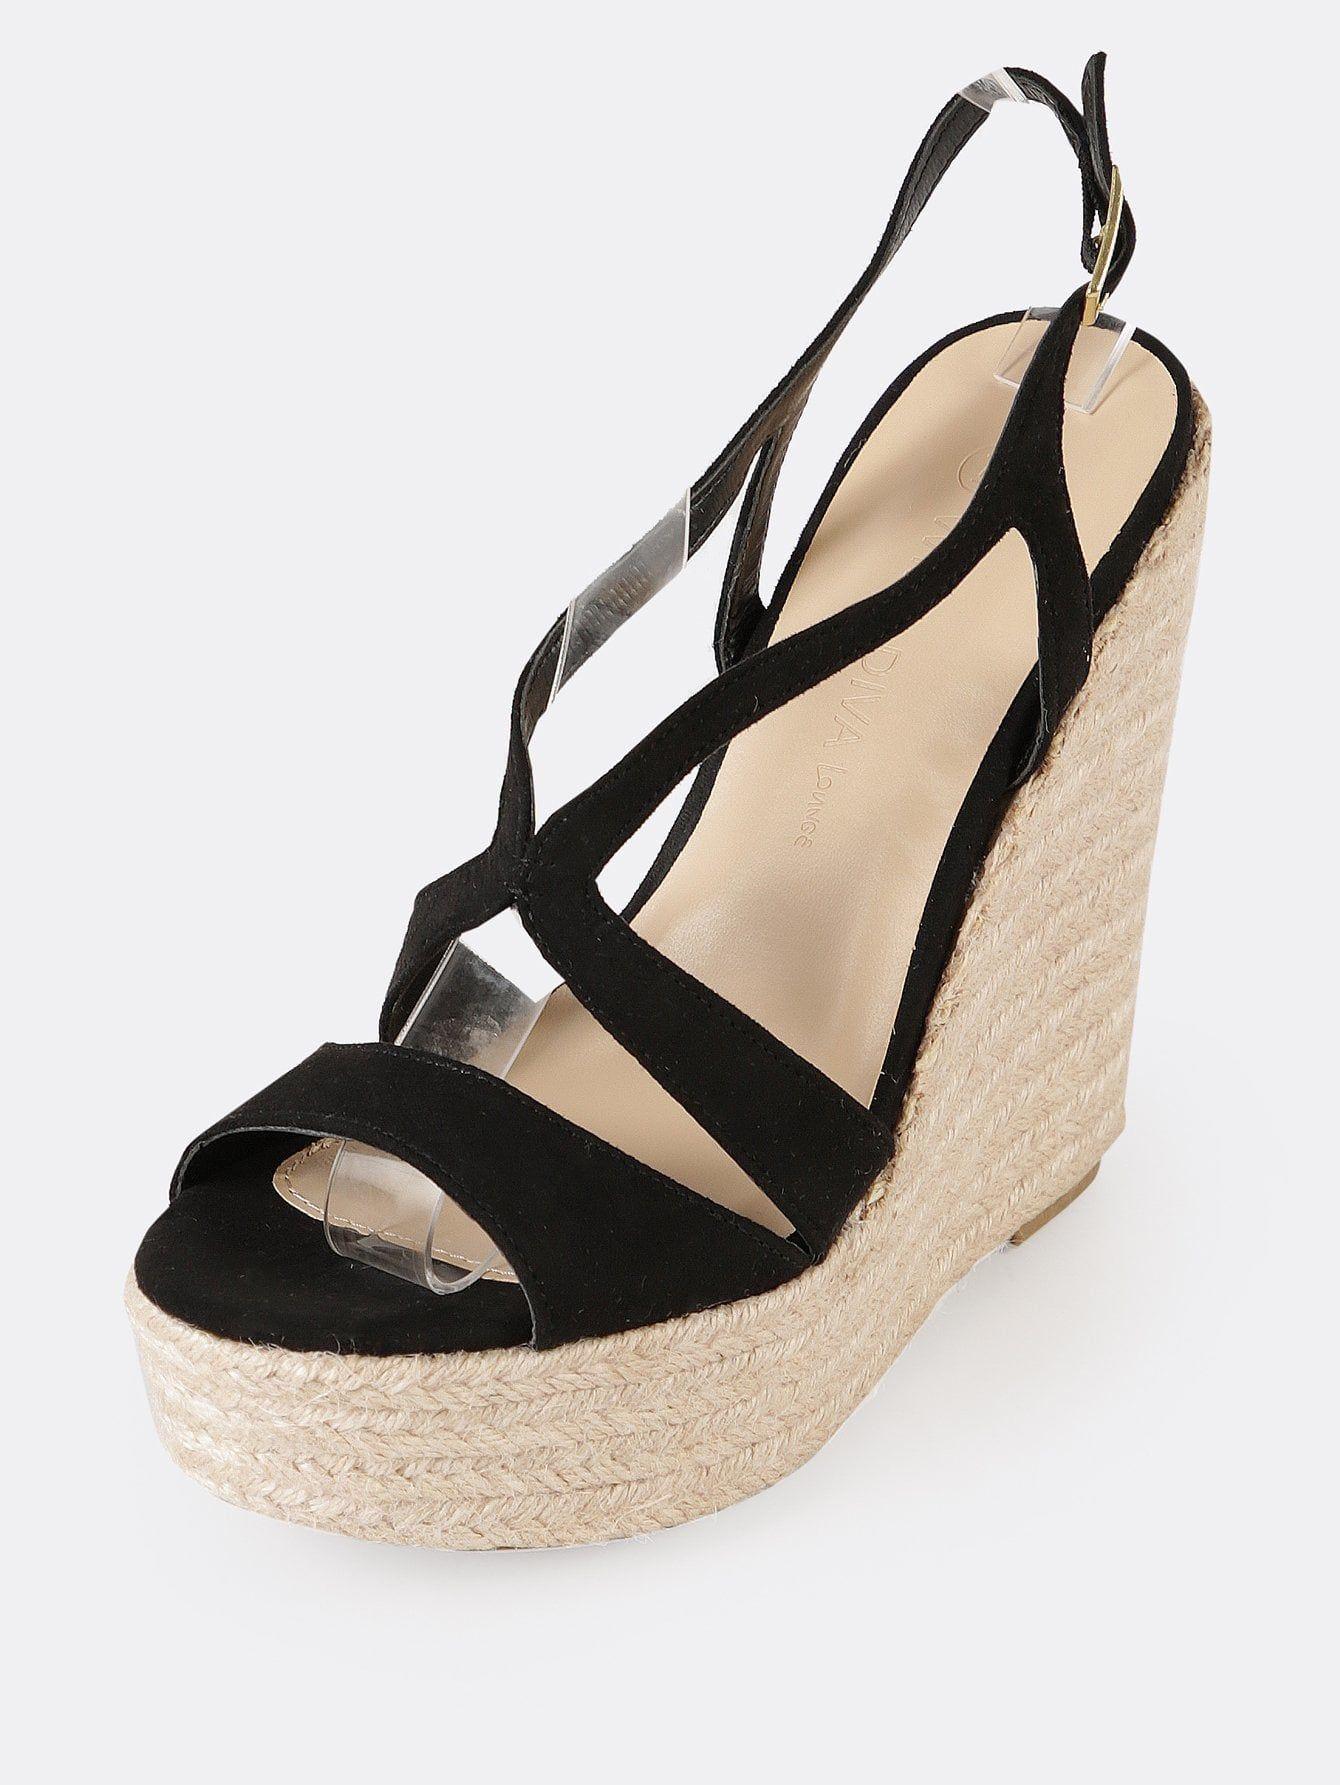 c32629764df Elegant Peep Toe Platform Strappy Black High Heel Espadrille Espadrille  Platform Strappy Wedge Sandal